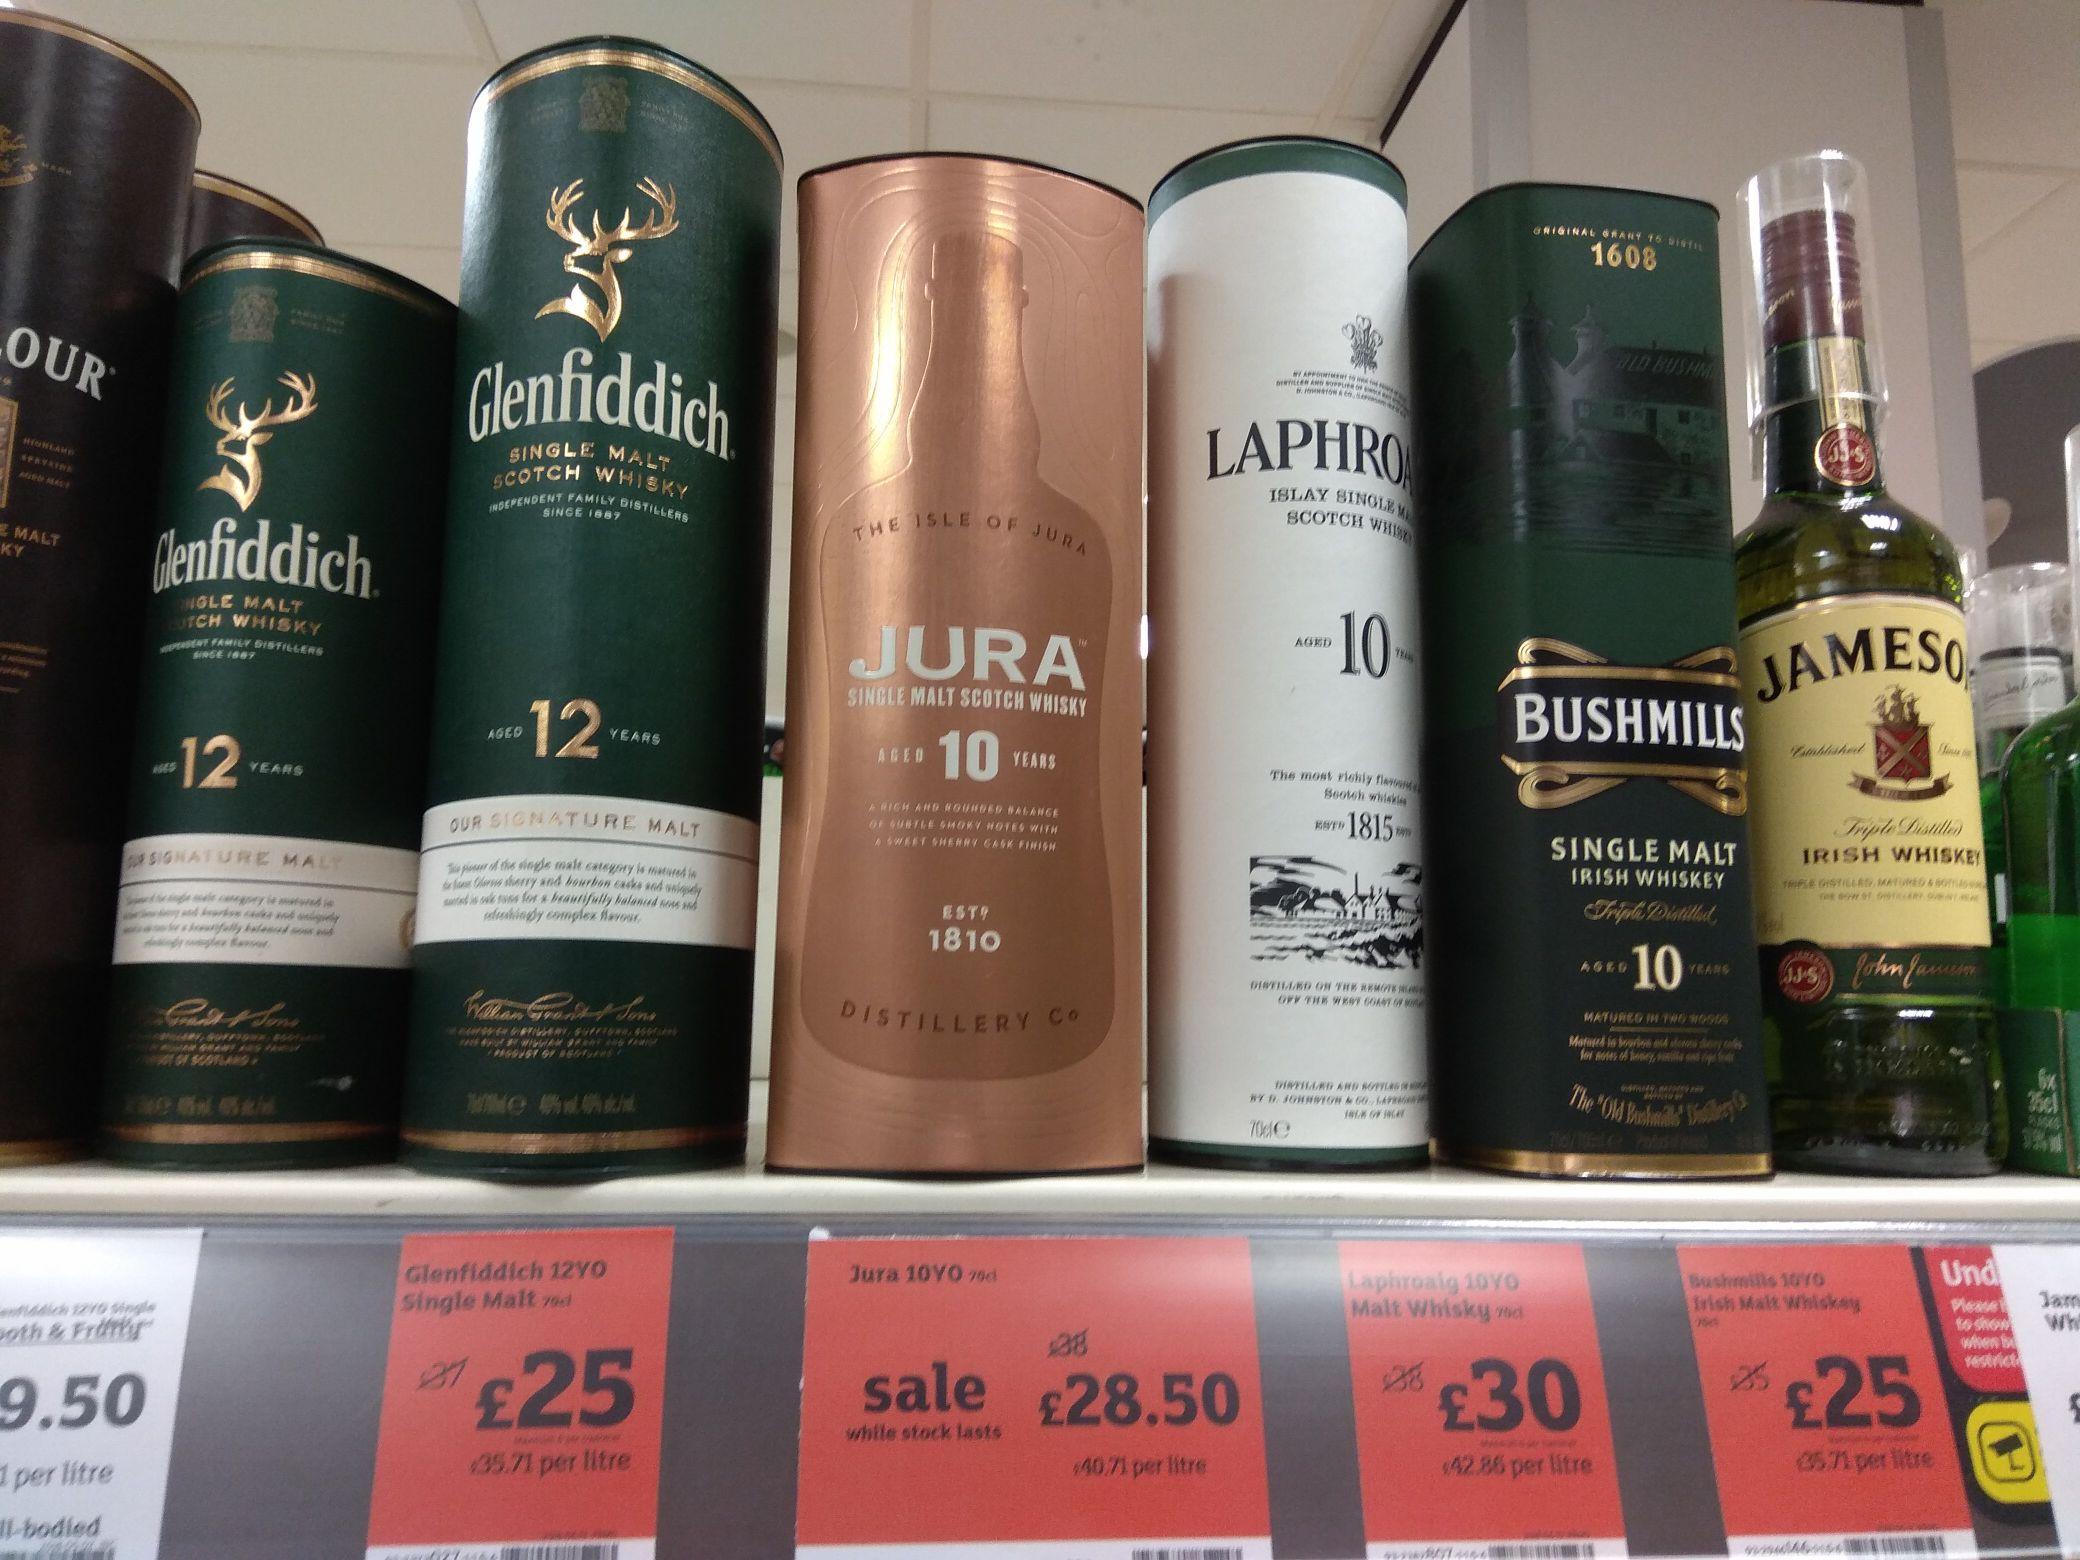 Glenfiddich 12 year old Single malt 70cl whisky - £25 @ Sainsbury's